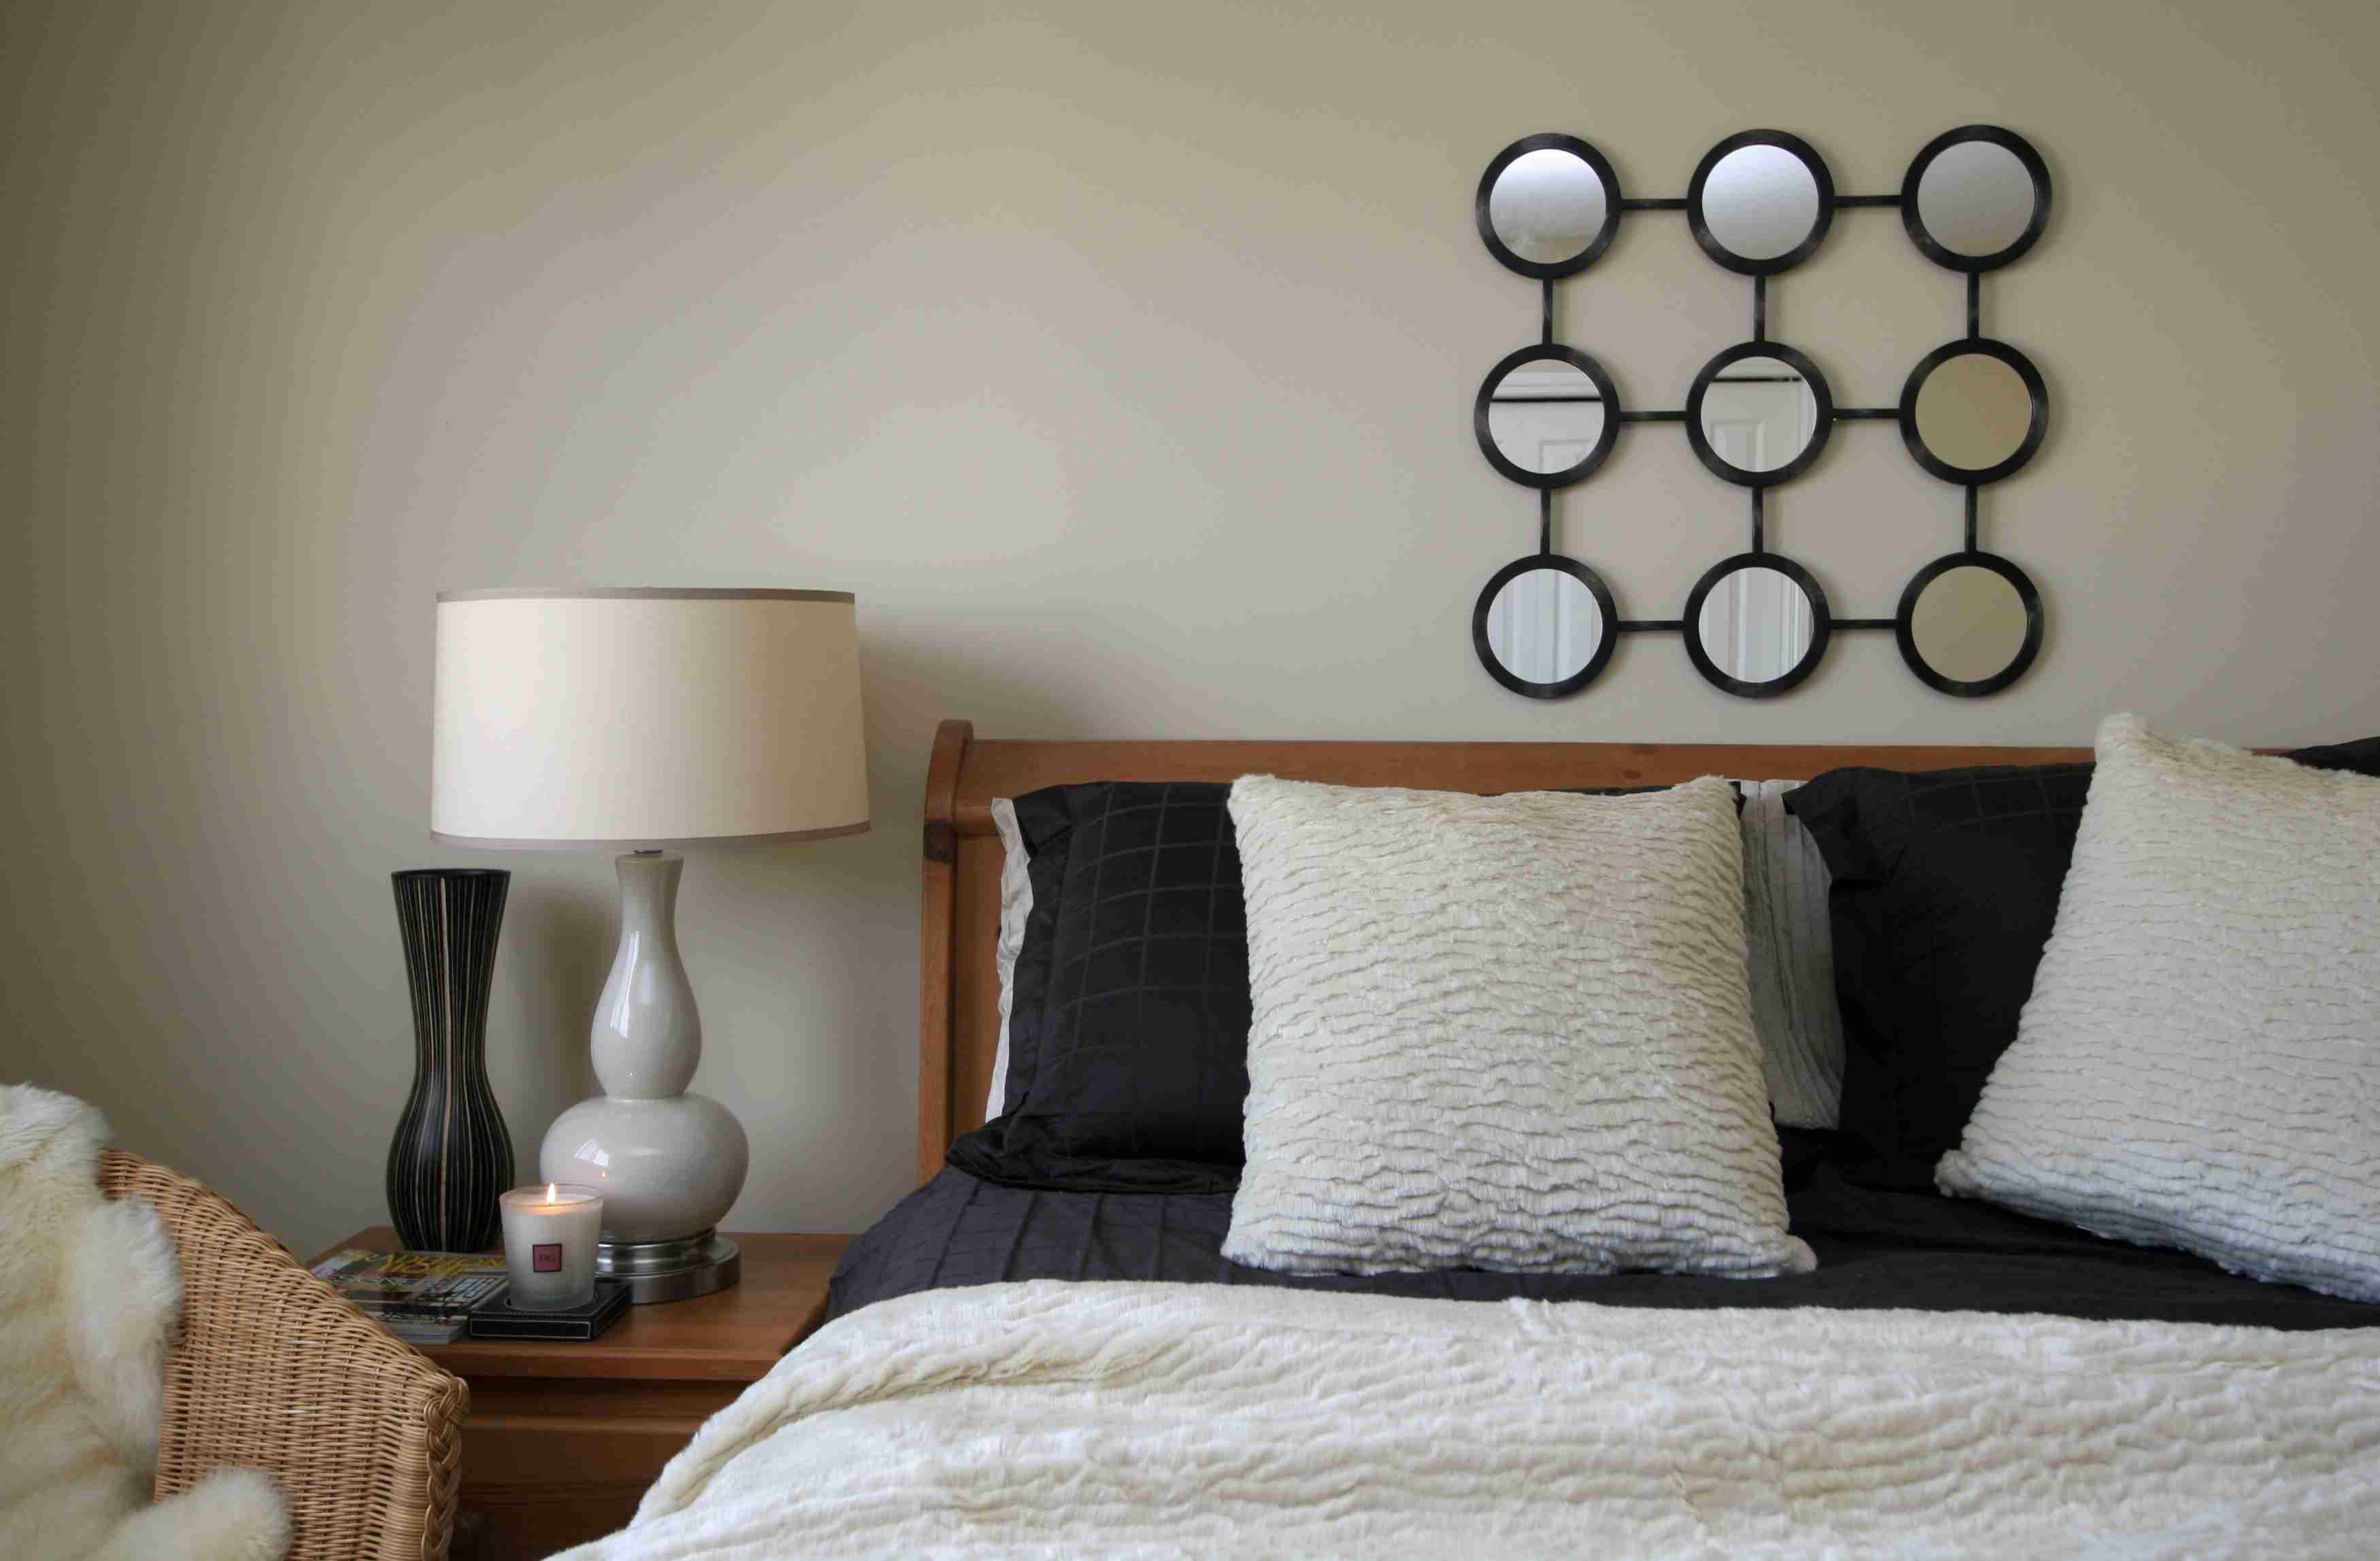 Ways To Make A Small Bedroom Look Bigger